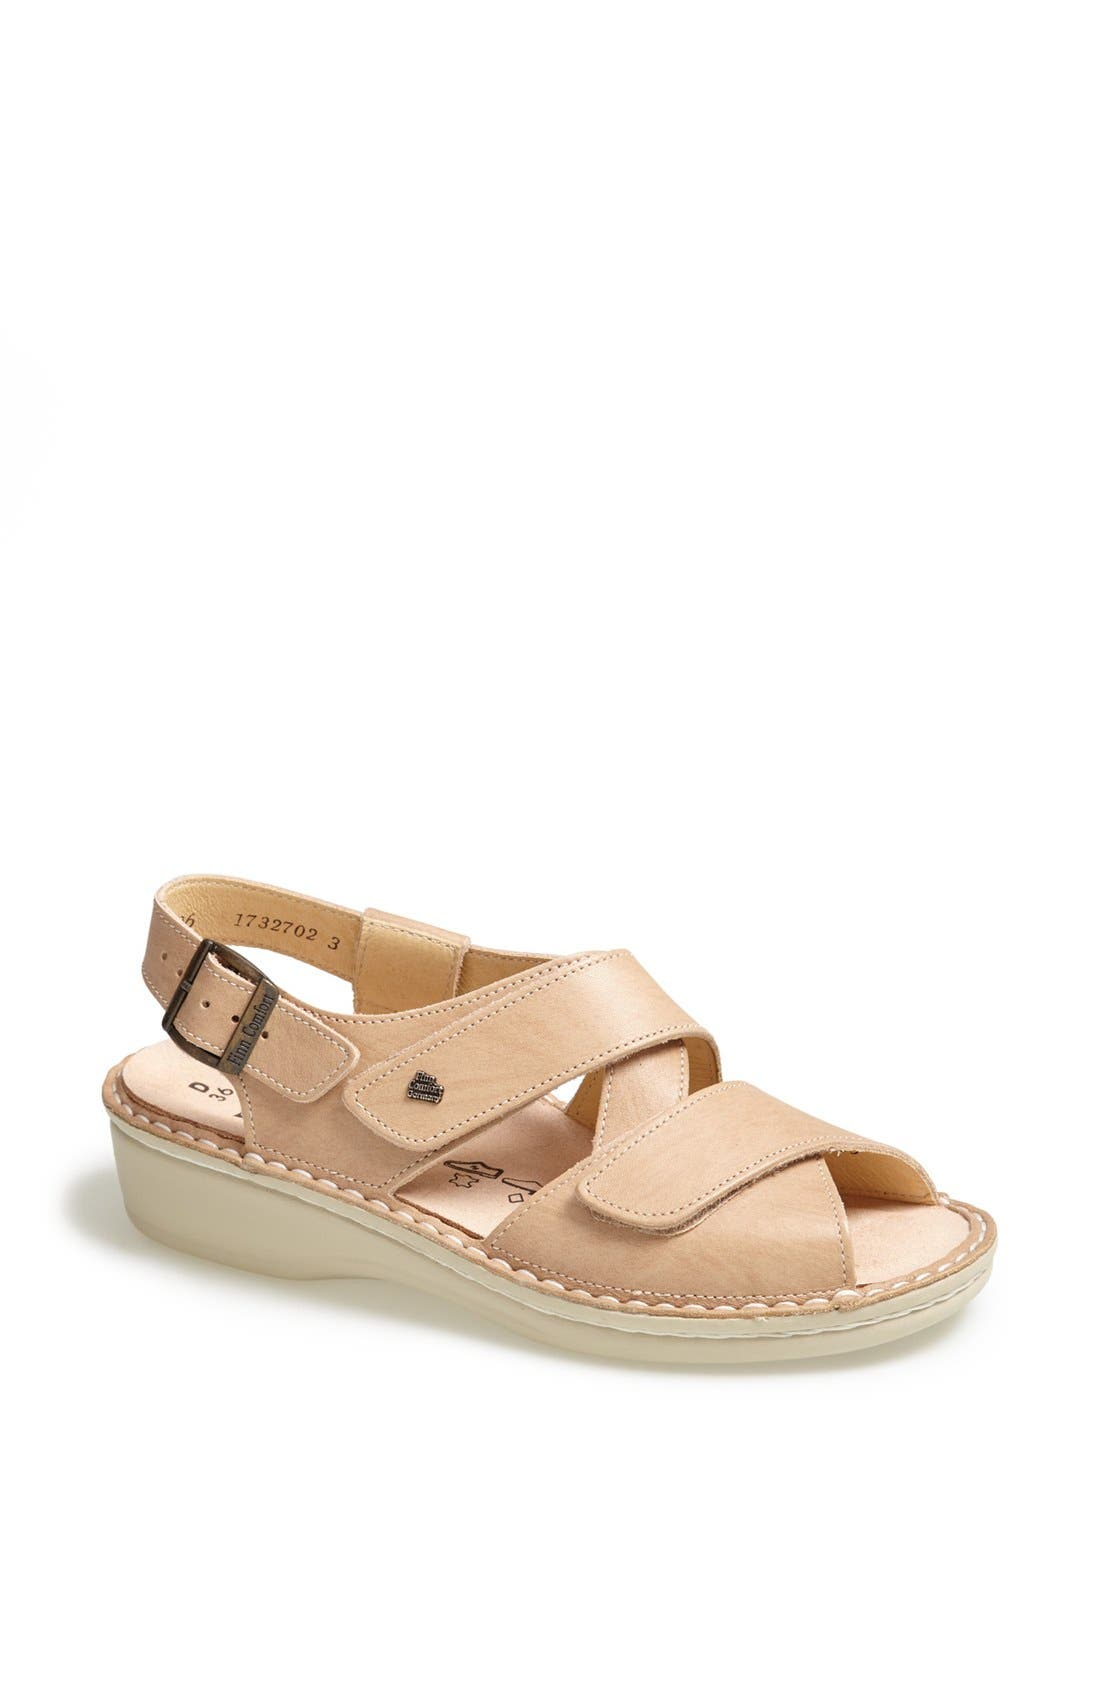 'Jersey' Sandal,                             Main thumbnail 1, color,